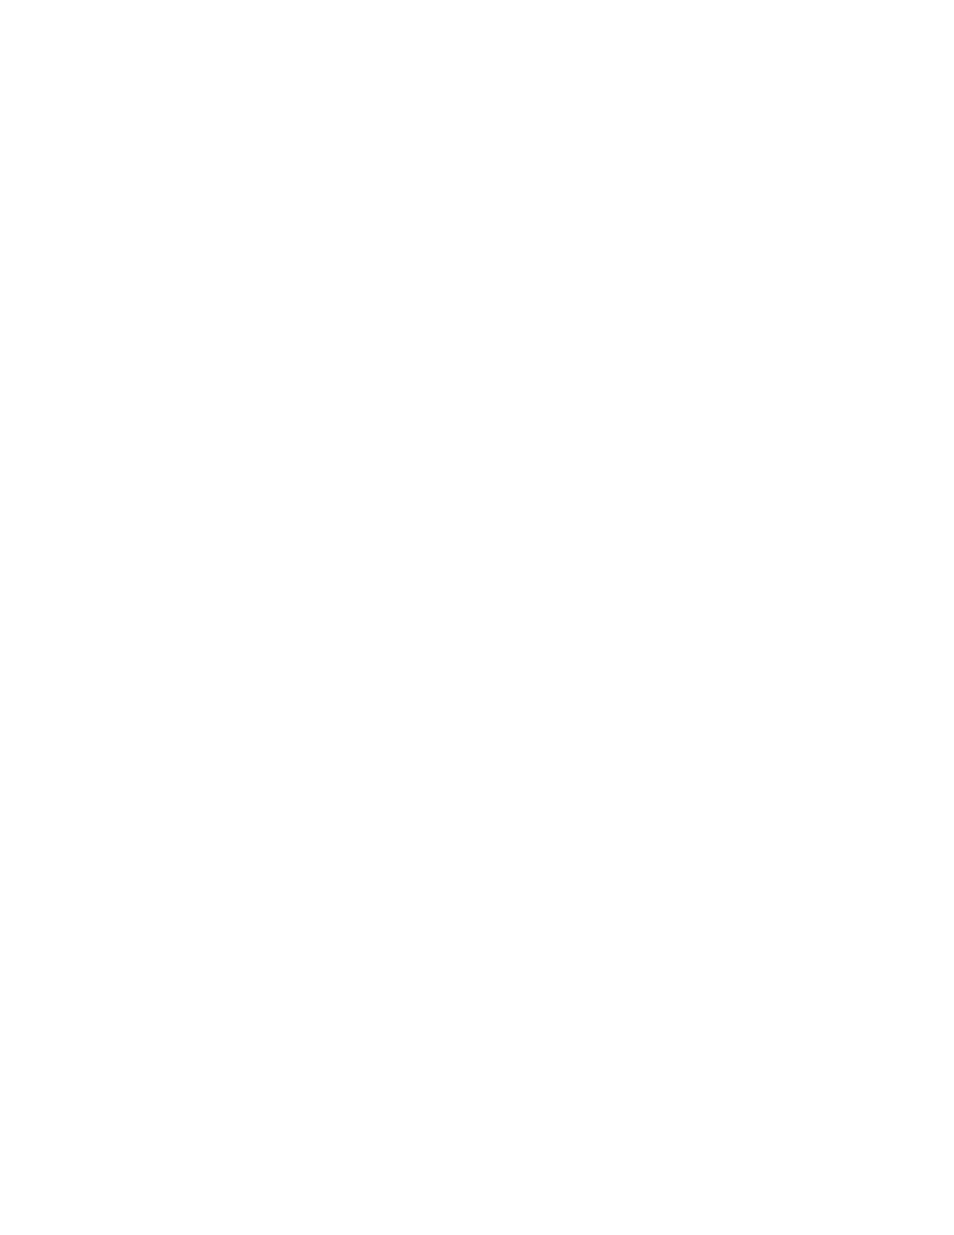 Compressor maintenance   MAHLE RTI TX200-UNDP User Manual   Page 11 / 17